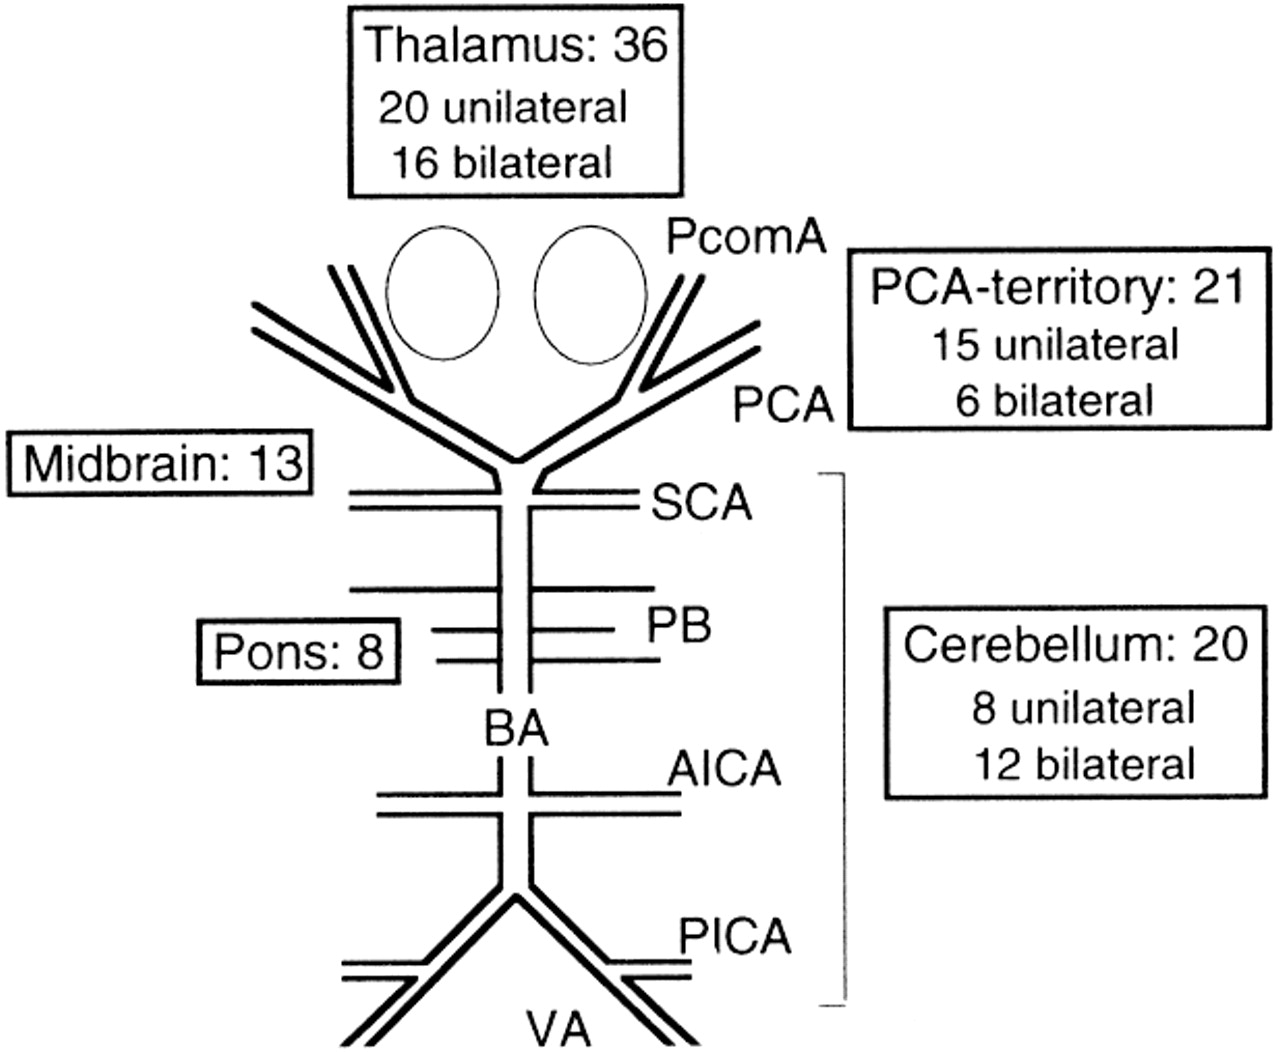 Basilar artery embolism | Neurology